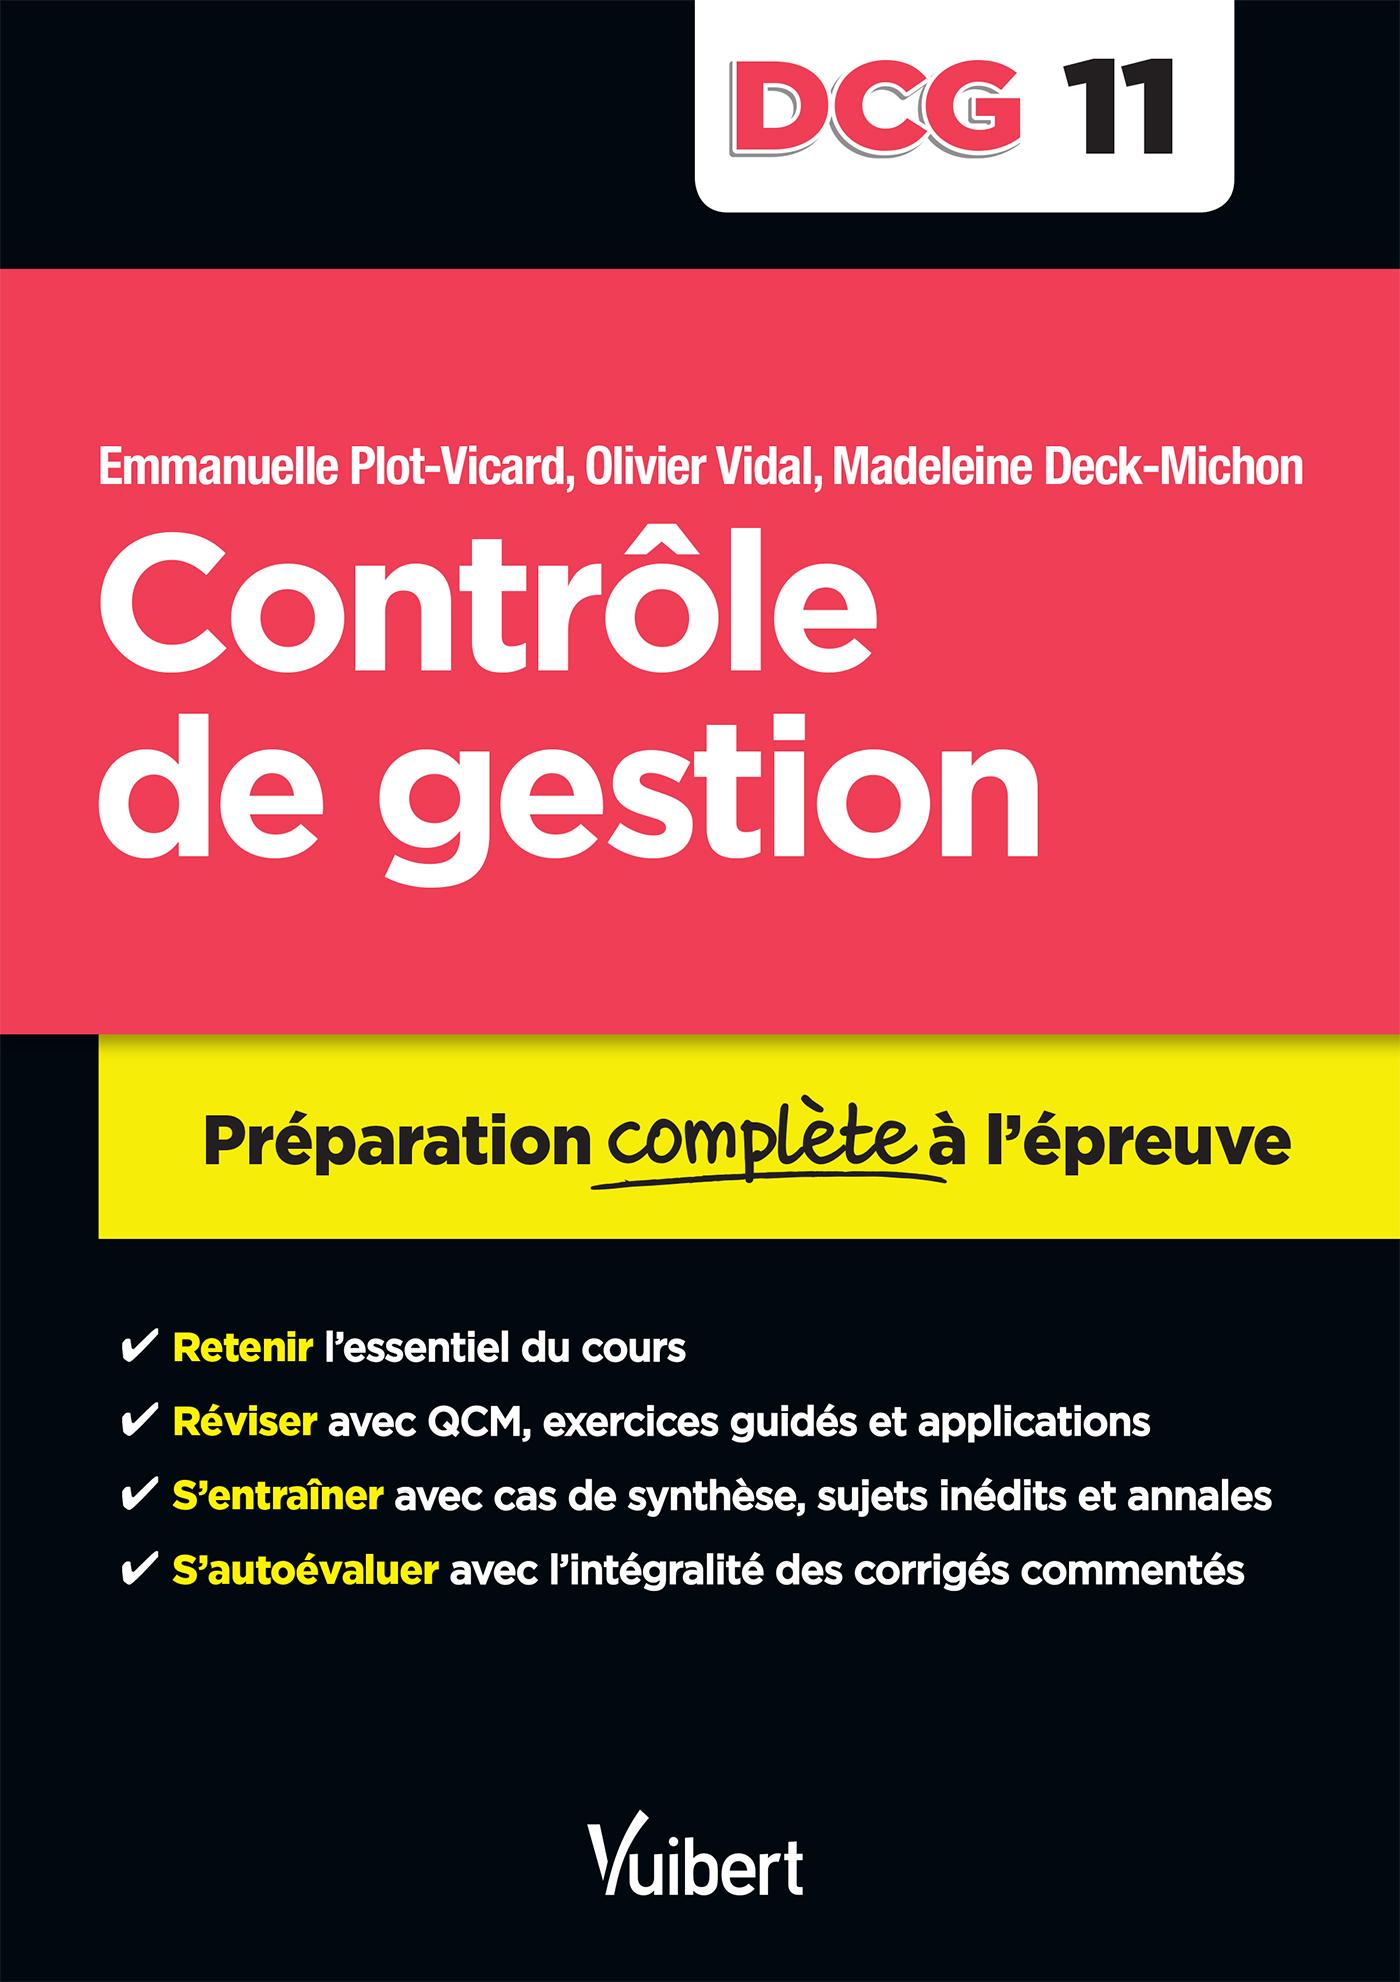 DCG 11 CONTROLE DE GESTION